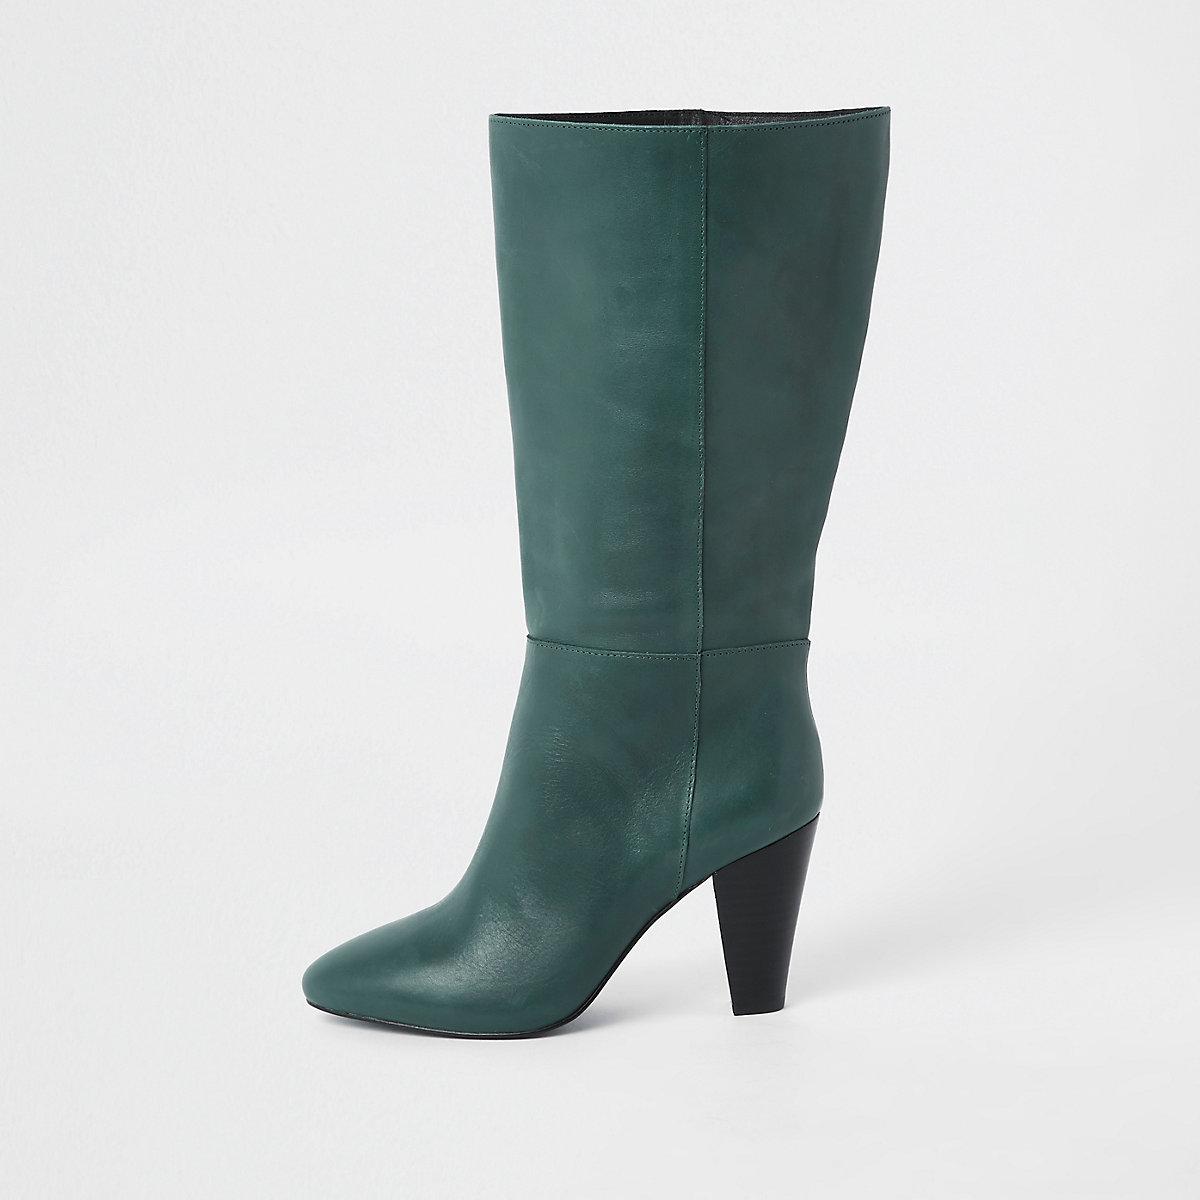 Groene leren kniehoge laarzen met blokhak Groene leren kniehoge laarzen met  blokhak ...